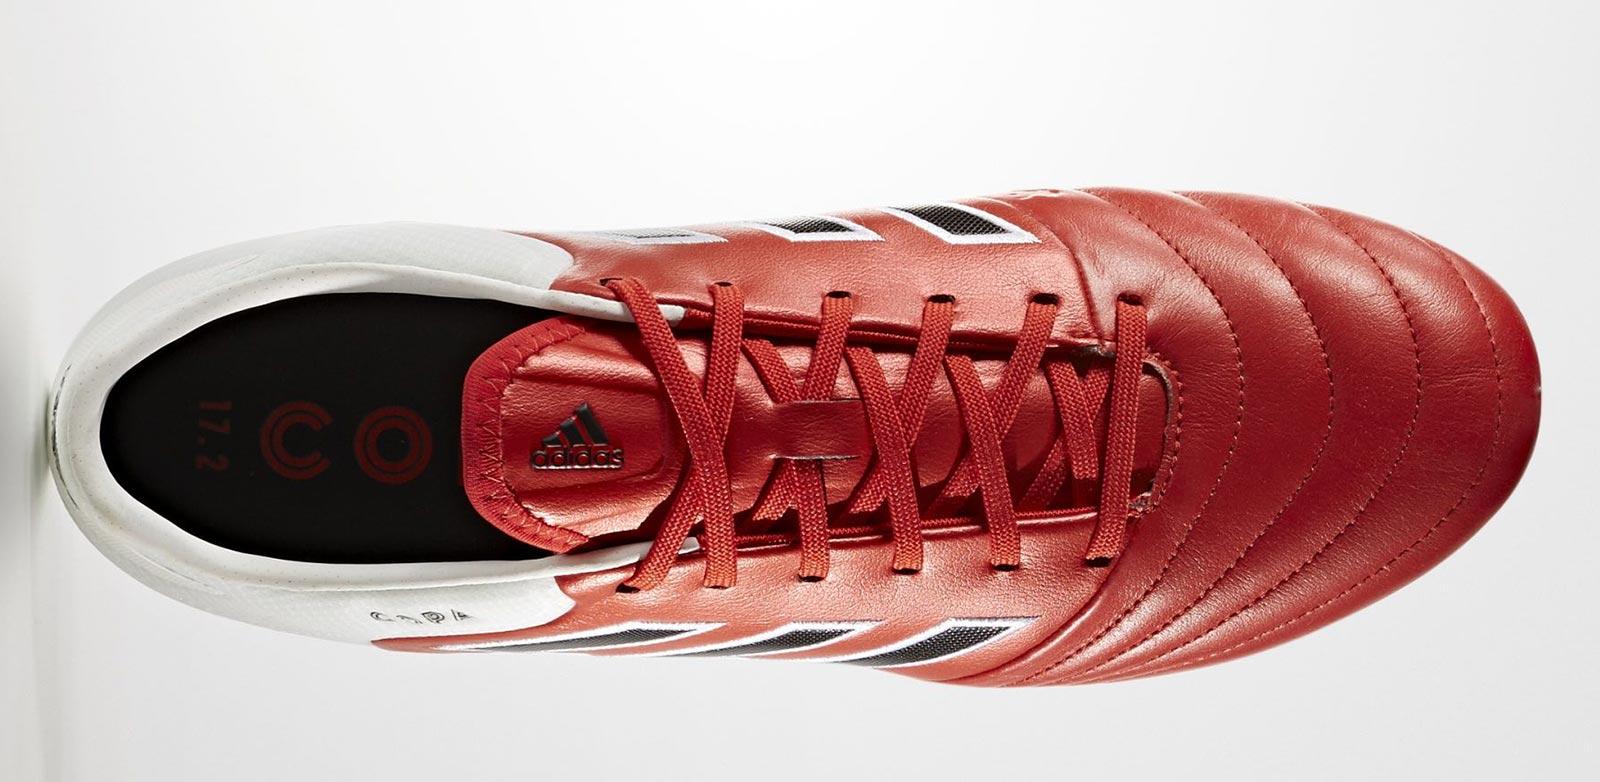 adidas-copa-17-2-overhead